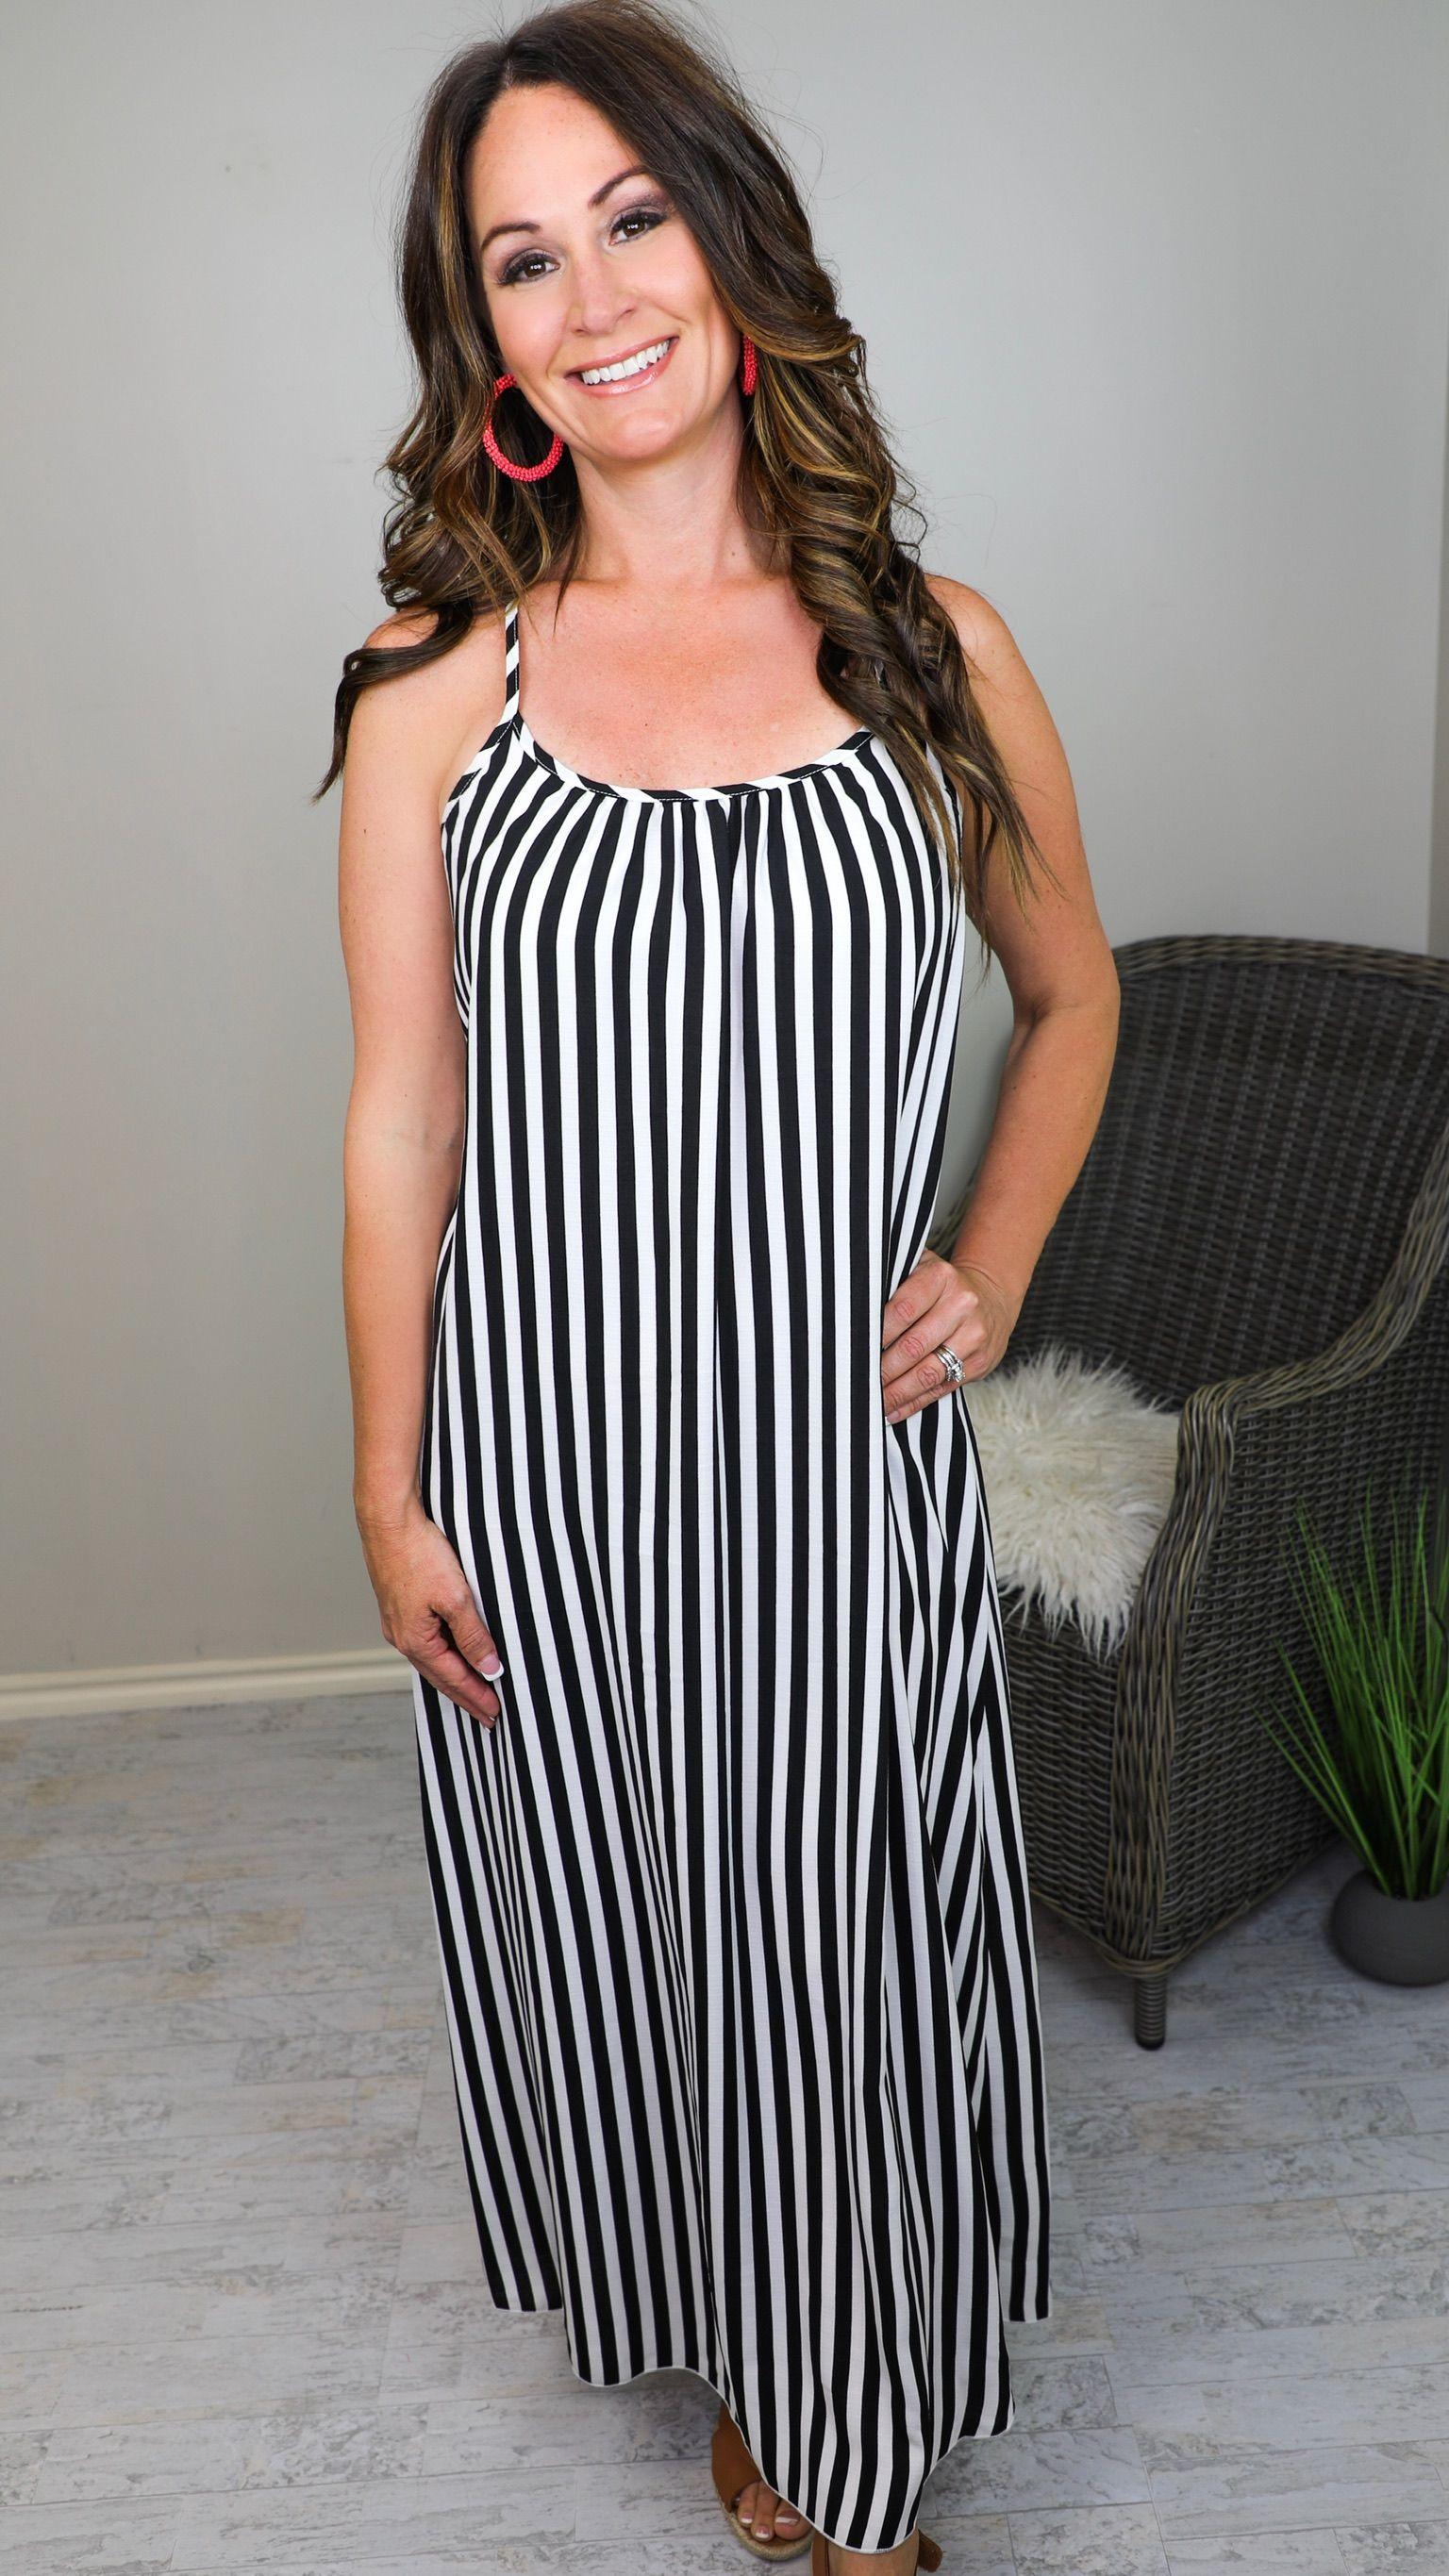 Black White Vertical Striped Maxi Dress Vertical Striped Maxi Dress Dresses Maxi Dress [ 2731 x 1536 Pixel ]